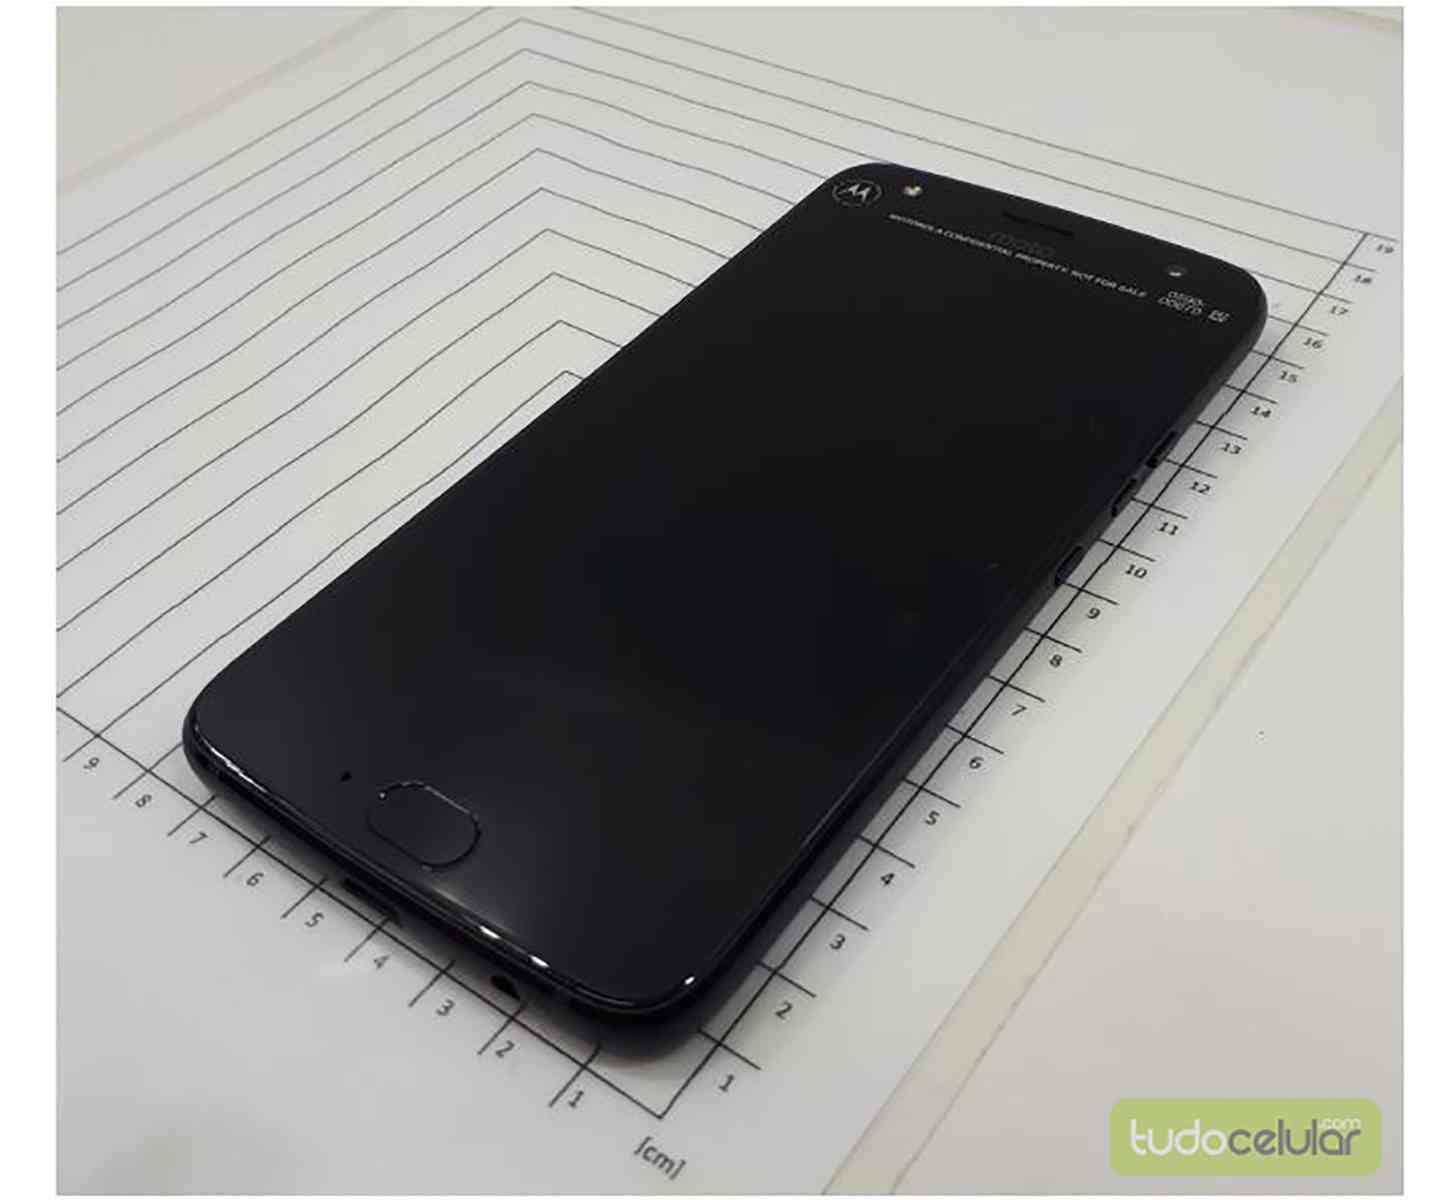 Moto X4 photos leak front